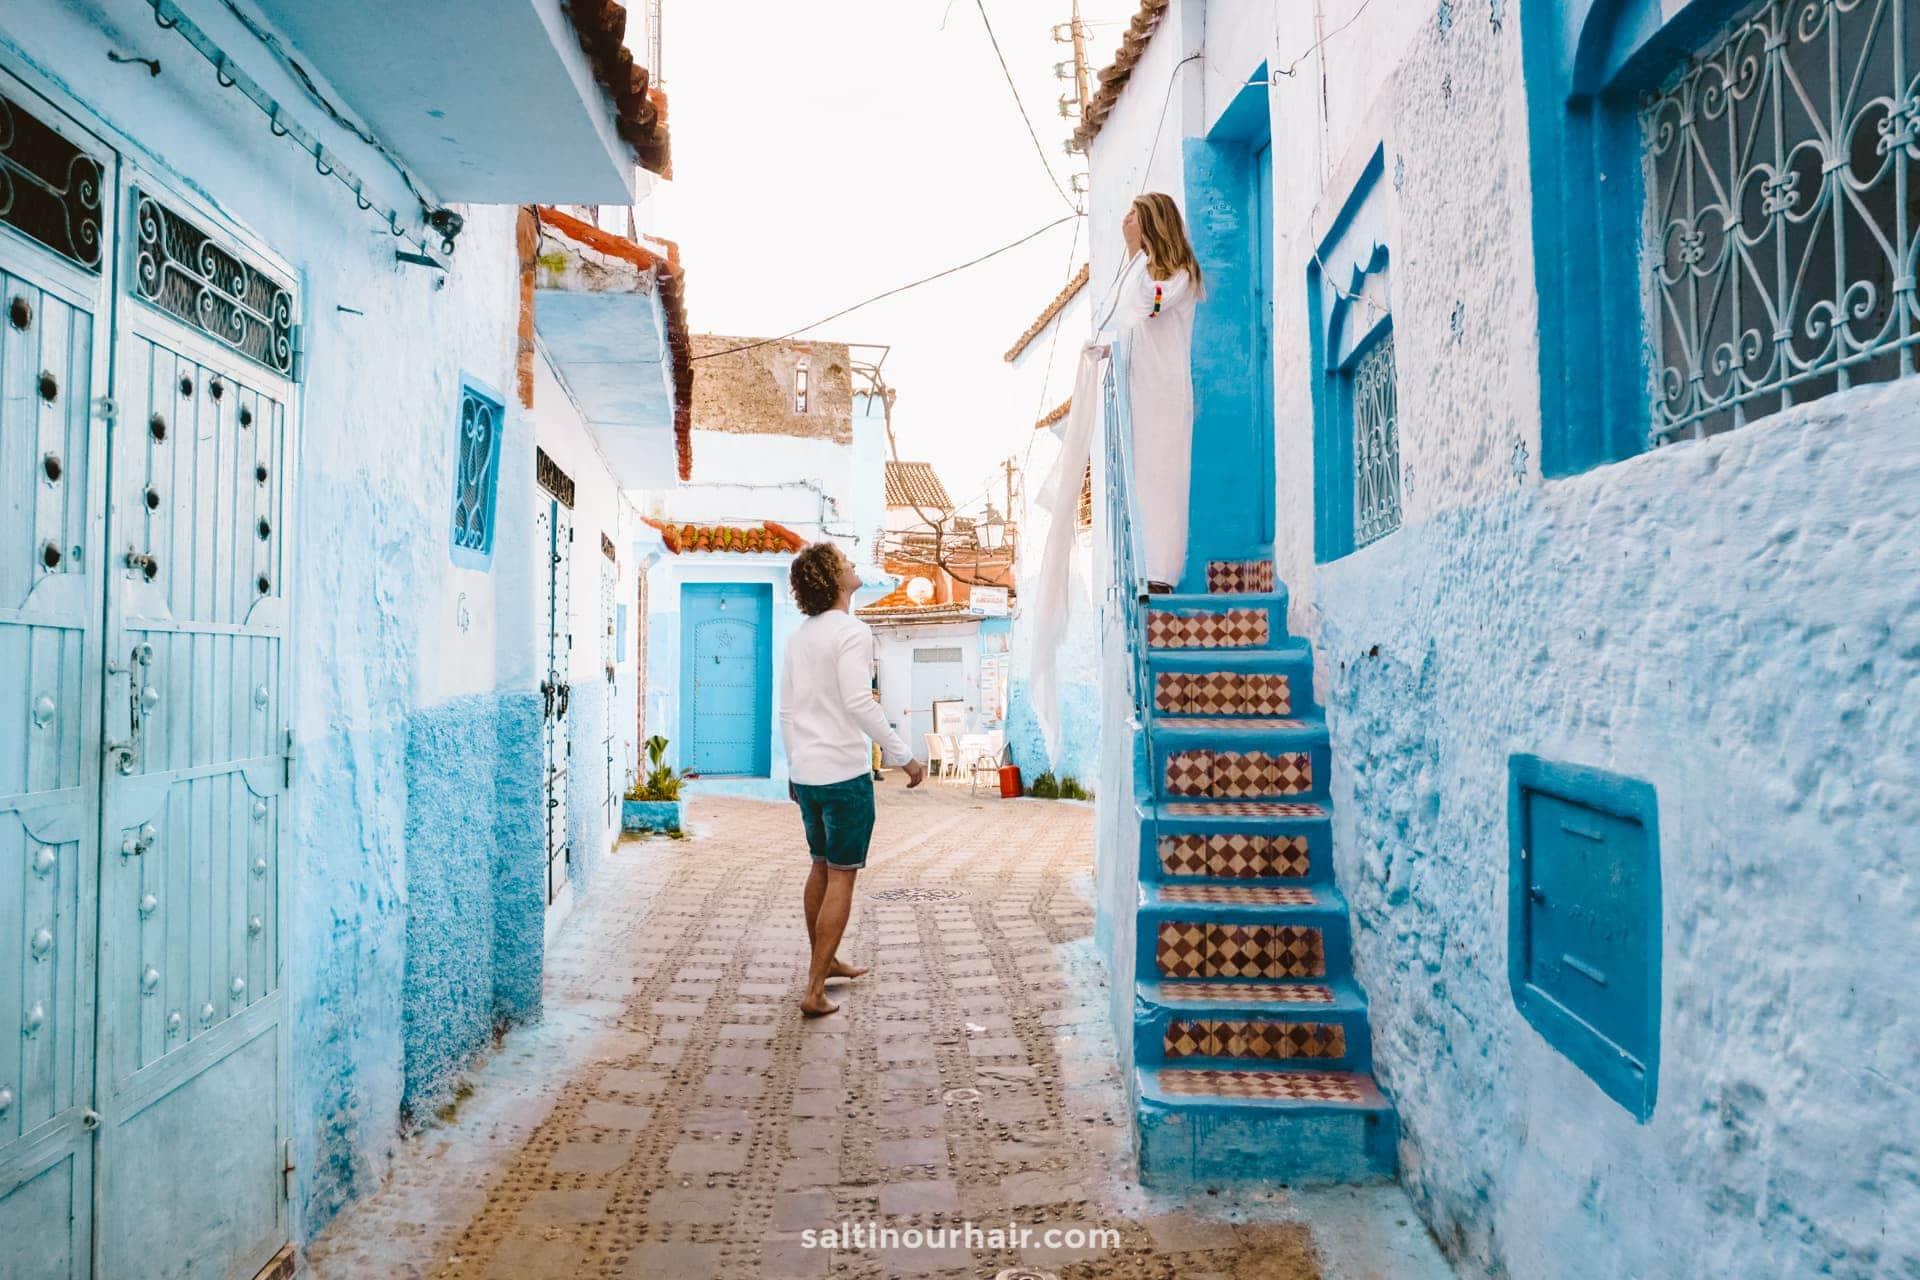 morocco guide saltinourhair